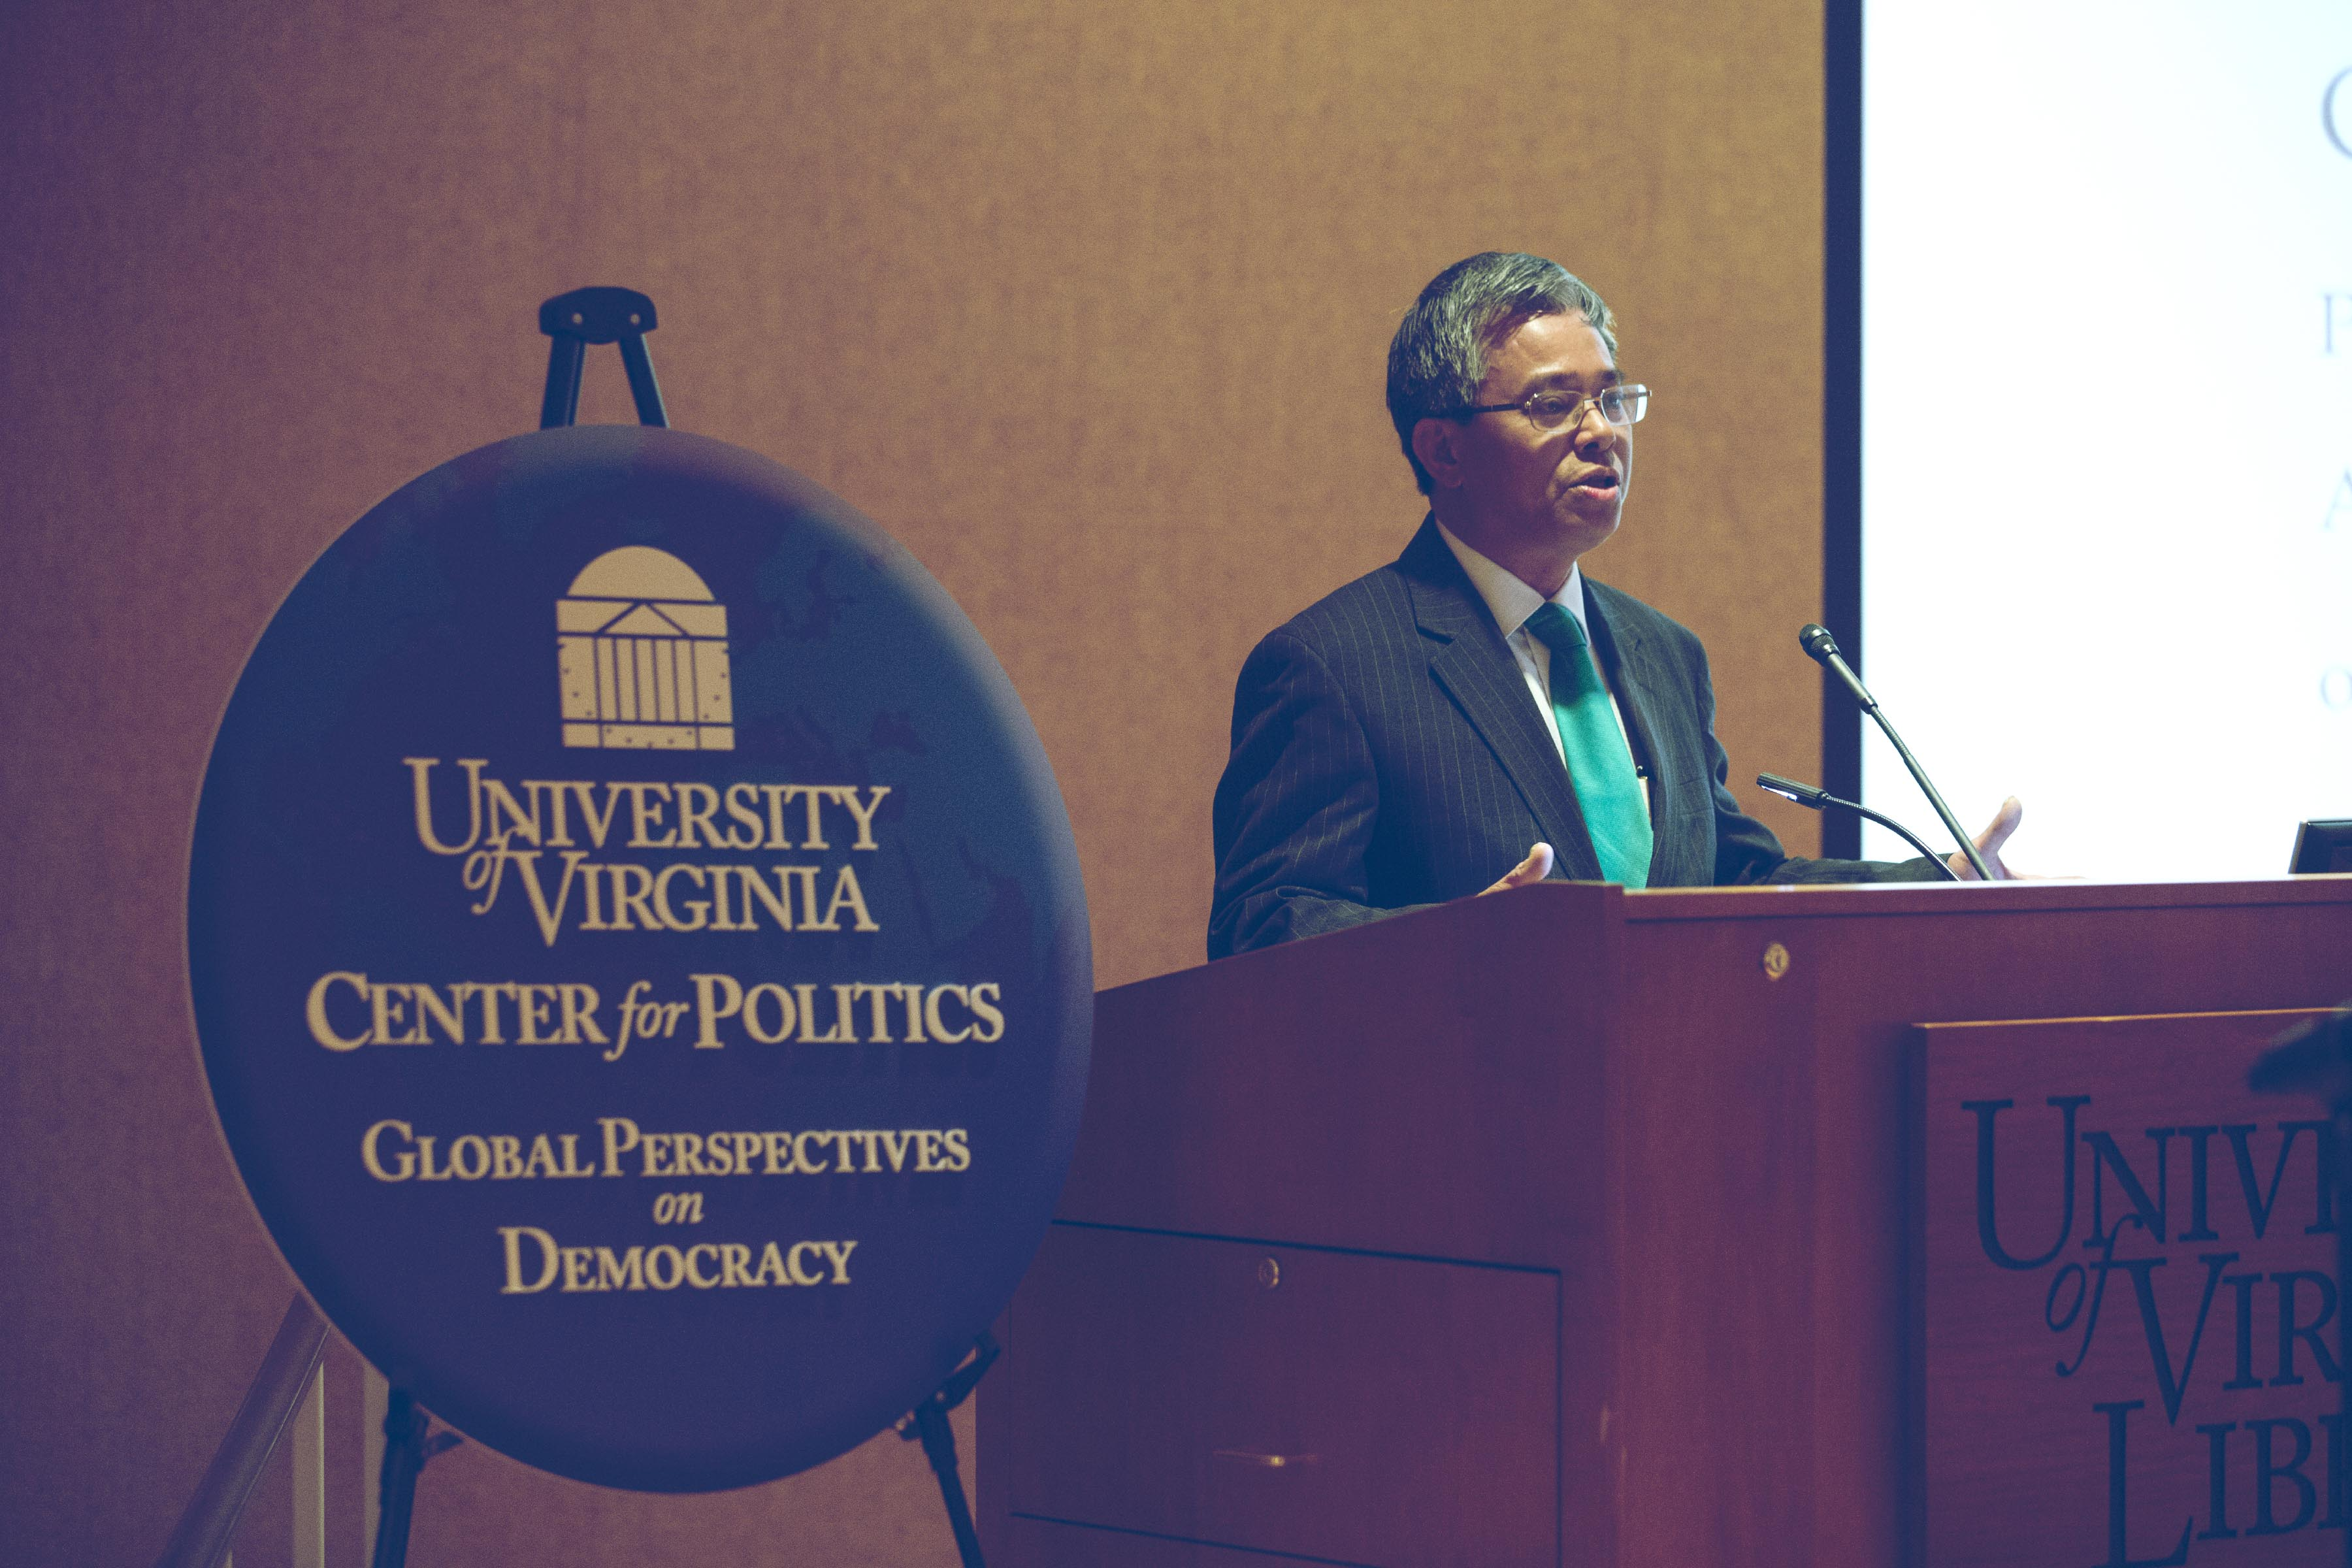 Vietnam's ambassador to the United States, Pham Quang Vinh, spoke at UVA on Tuesday. (Photo by Dan Addison, University Communications)